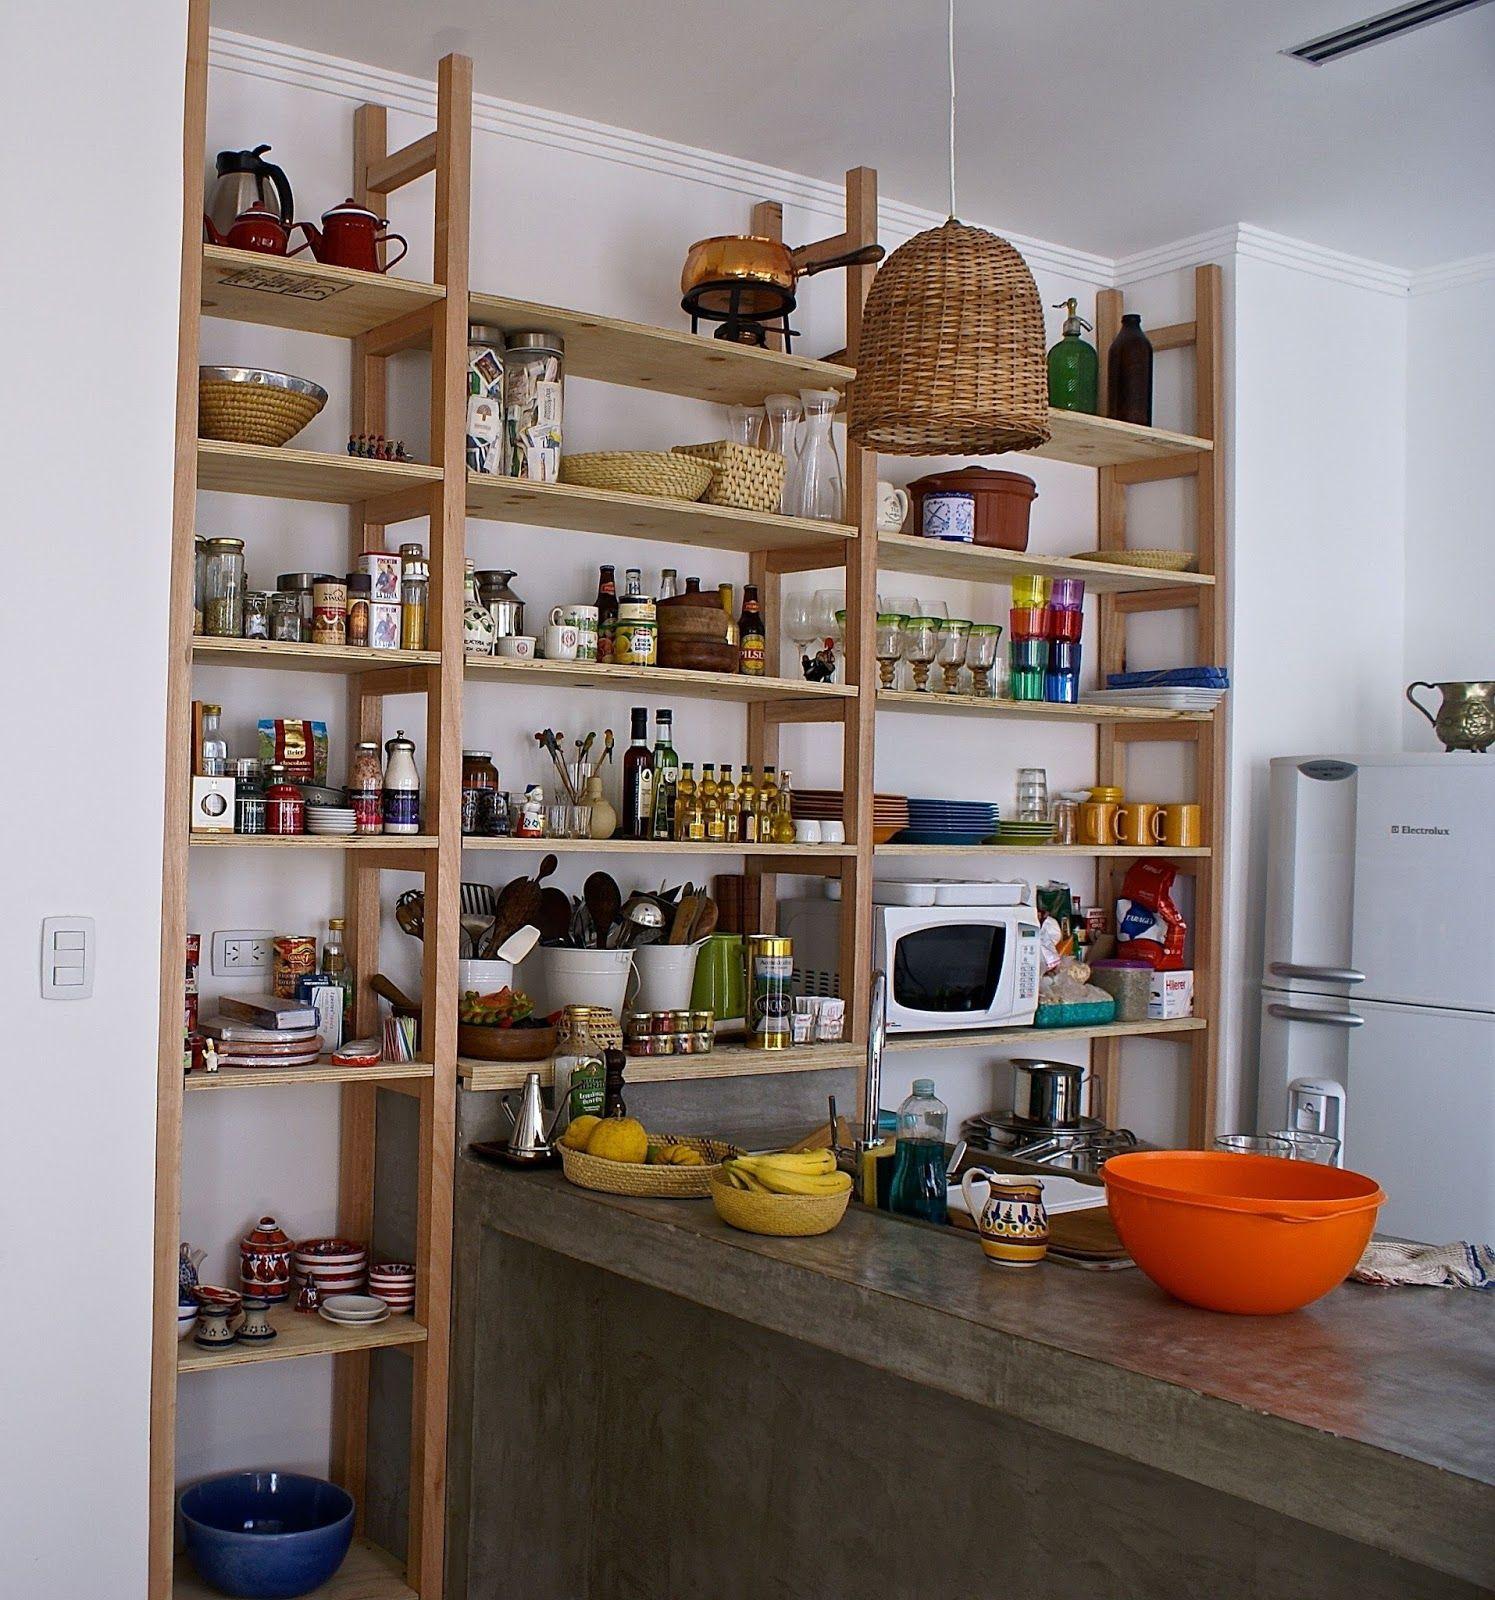 Pin de aminta paysse en cocinas estanteria cocina - Estanterias de cocina ...